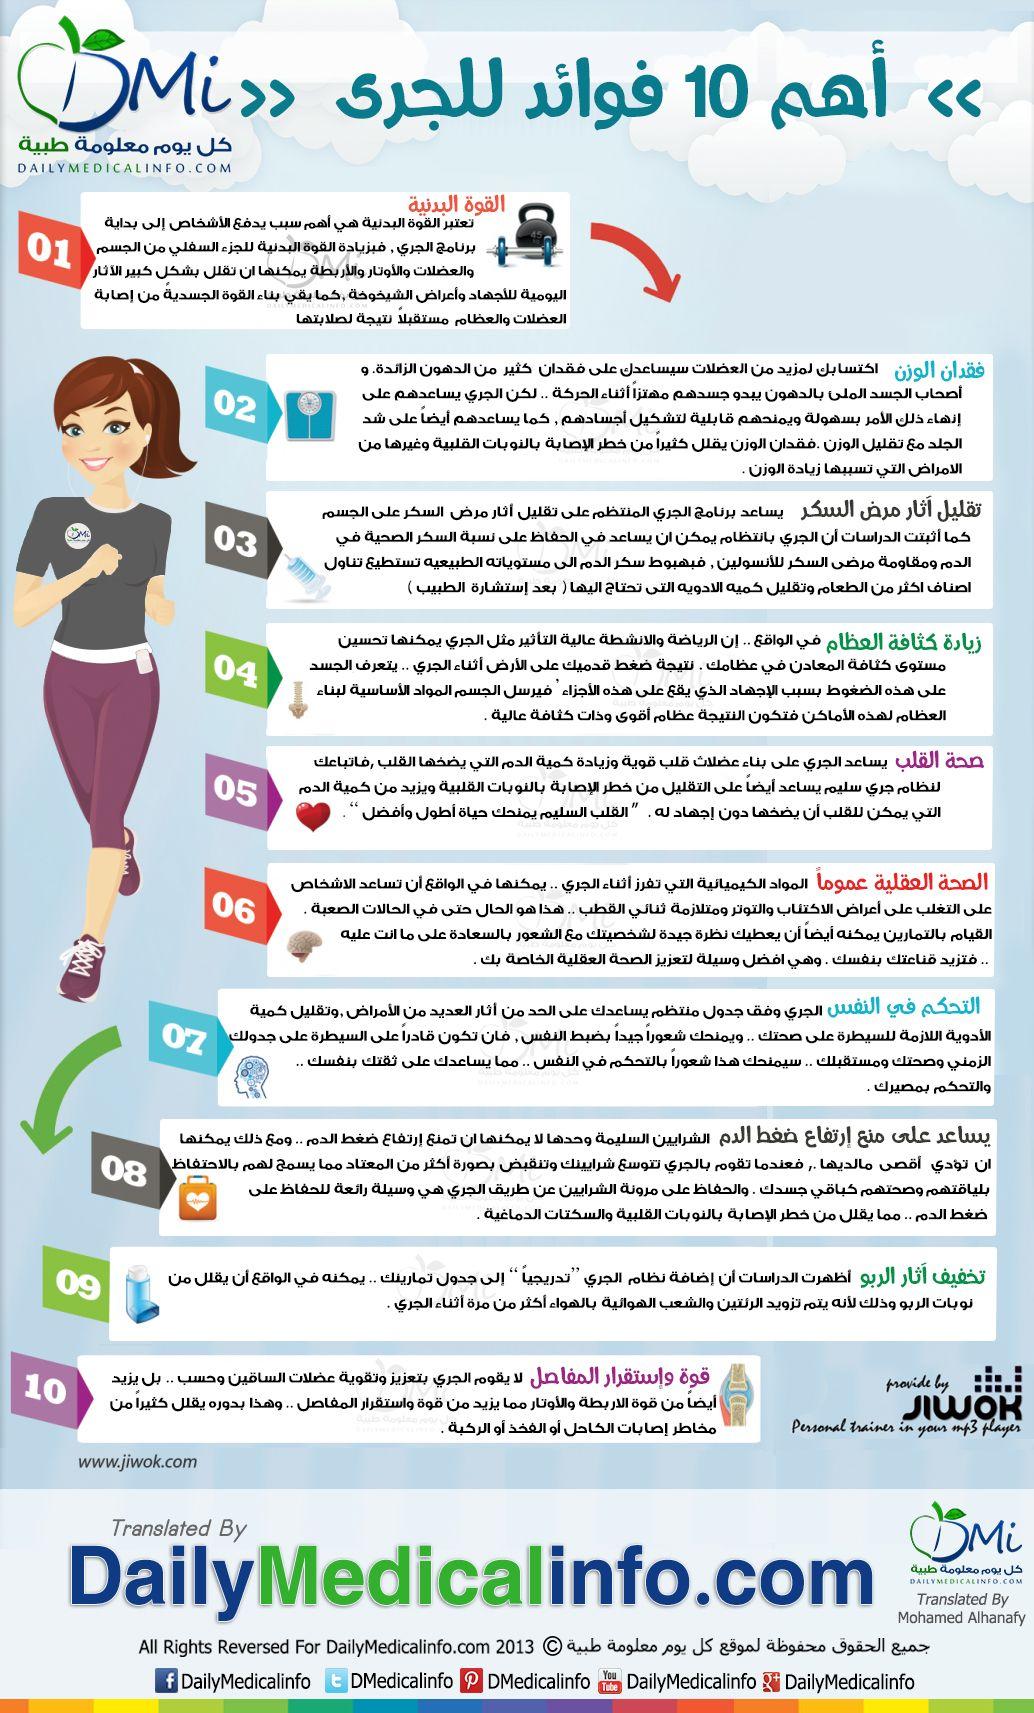 9d1594c8f انفوجرافيك | أهم 10 فوائد لرياضة الجرى | انفوجرافيك طبية | كل يوم معلومة  طبية